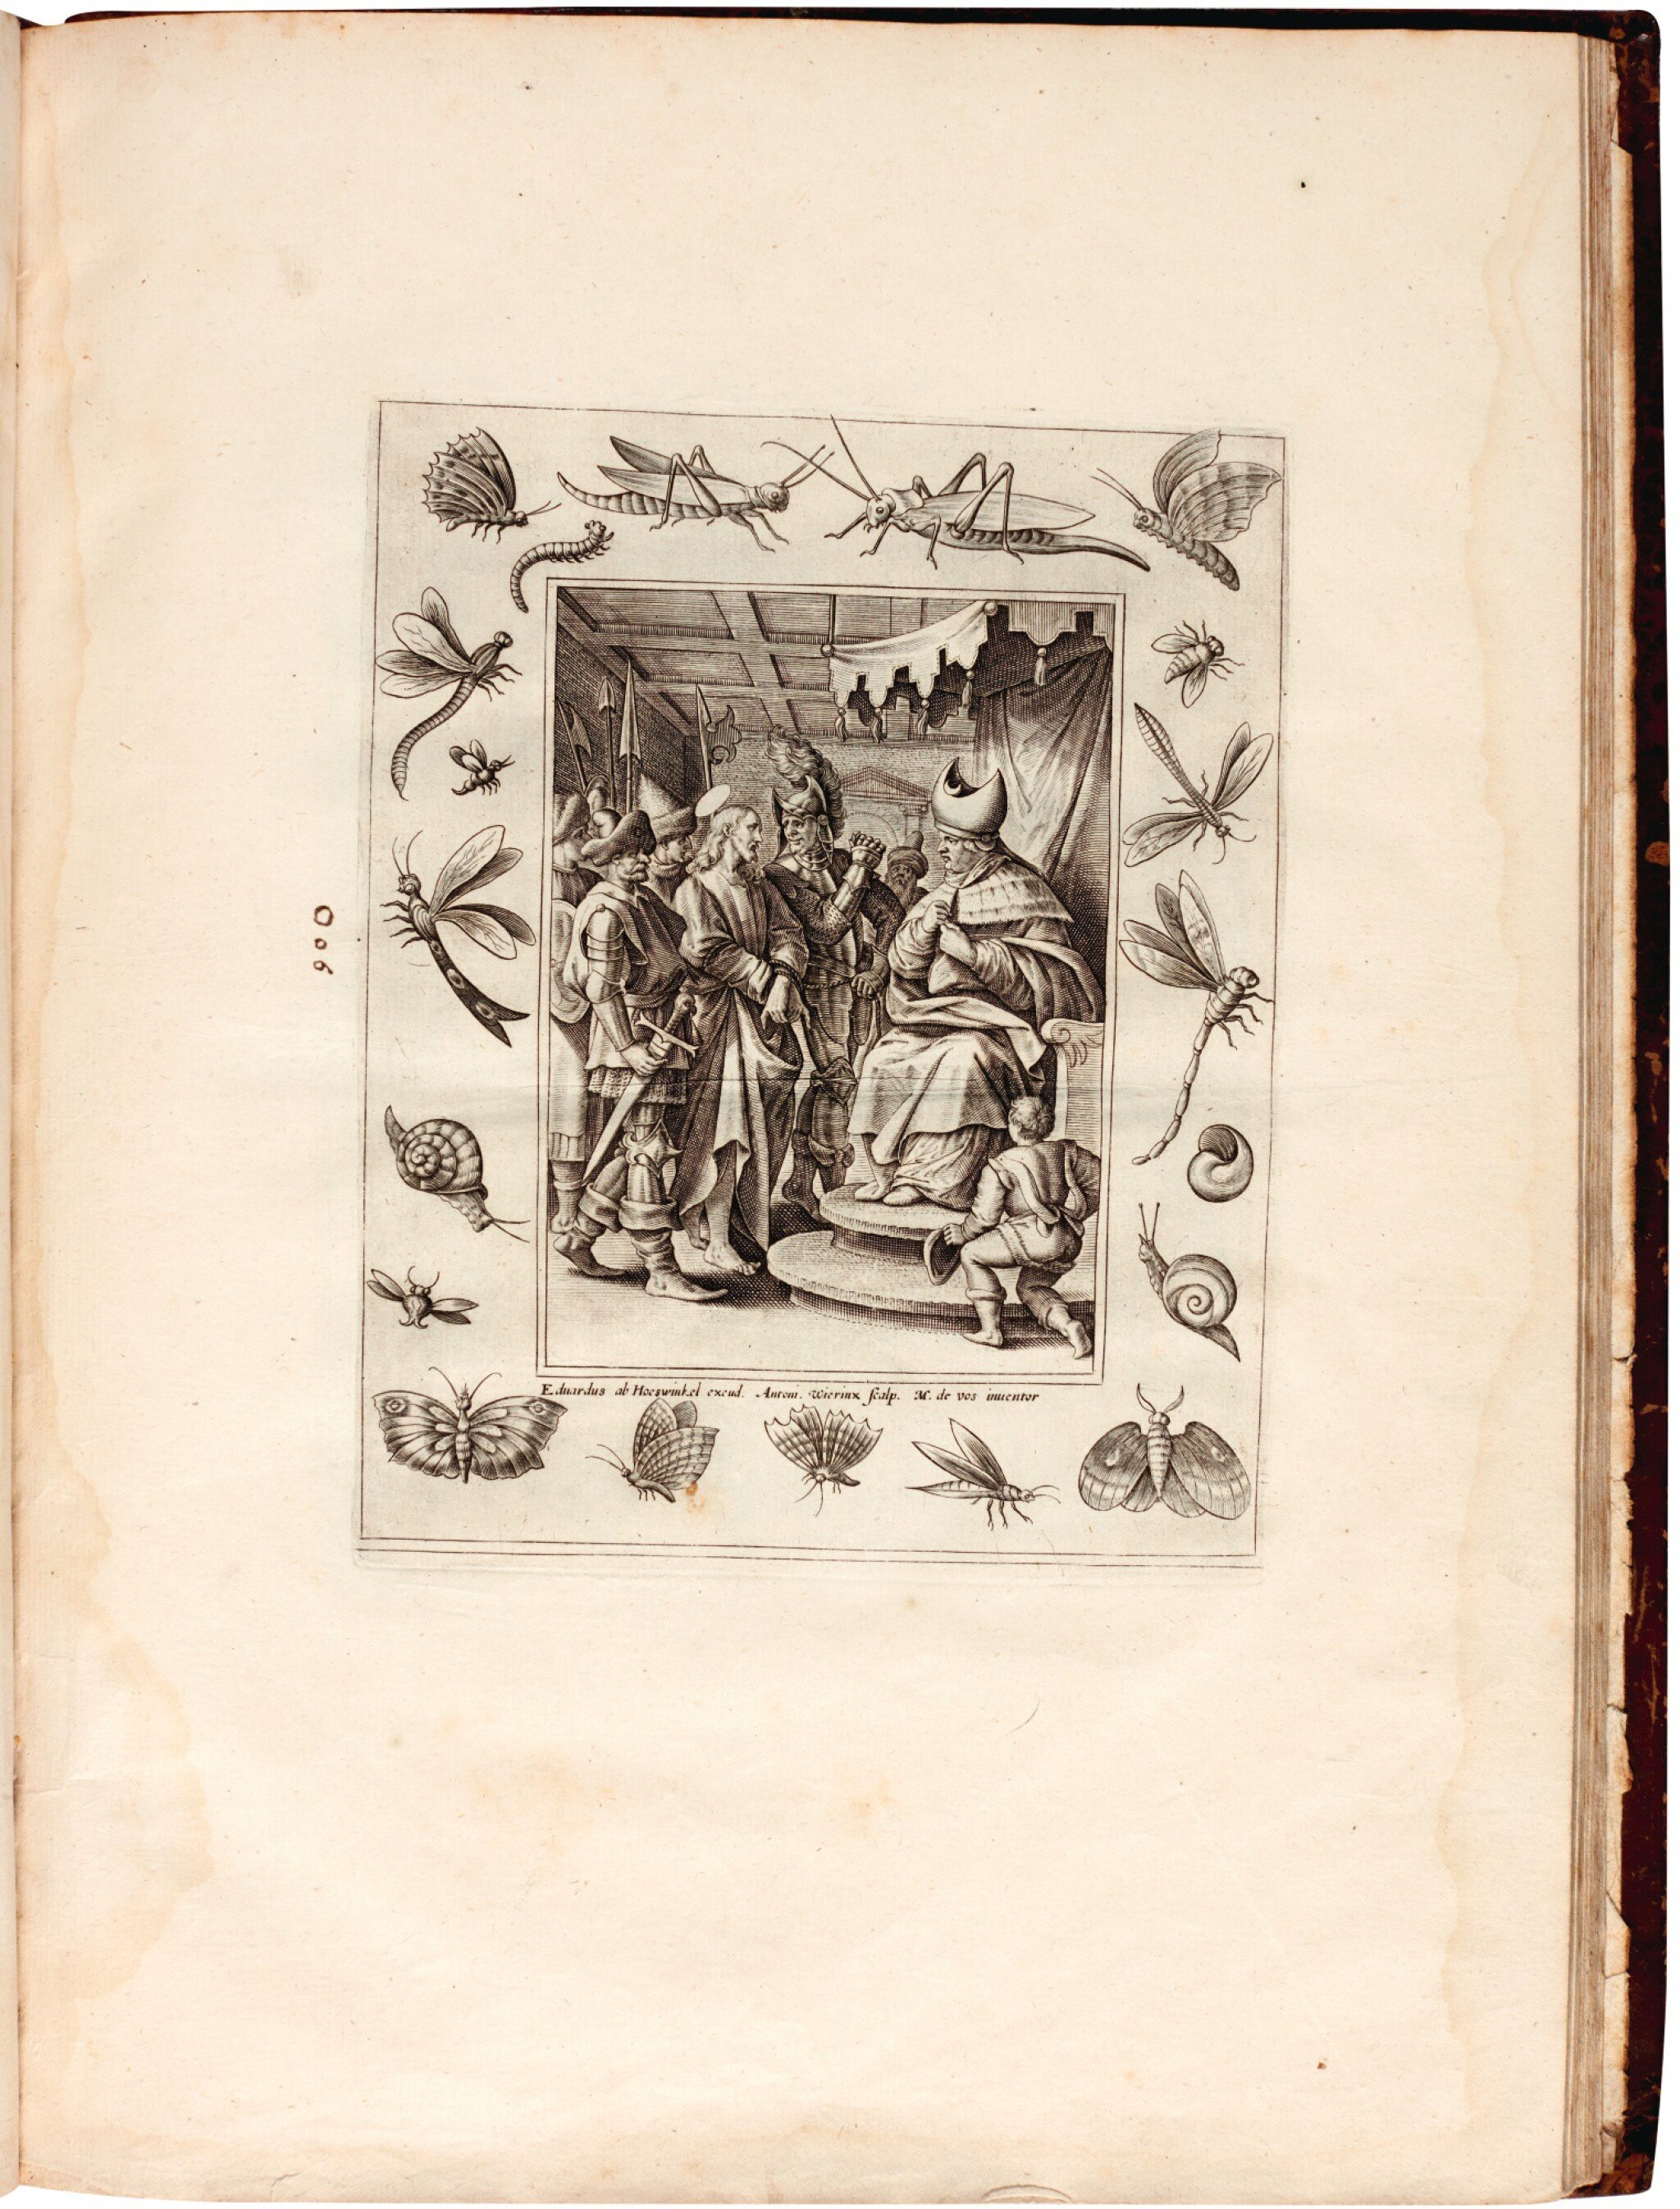 View full screen - View 1 of Lot 114. Galle, Septem opera misericordiae spiritualia, Antwerp, 1577, later English calf.